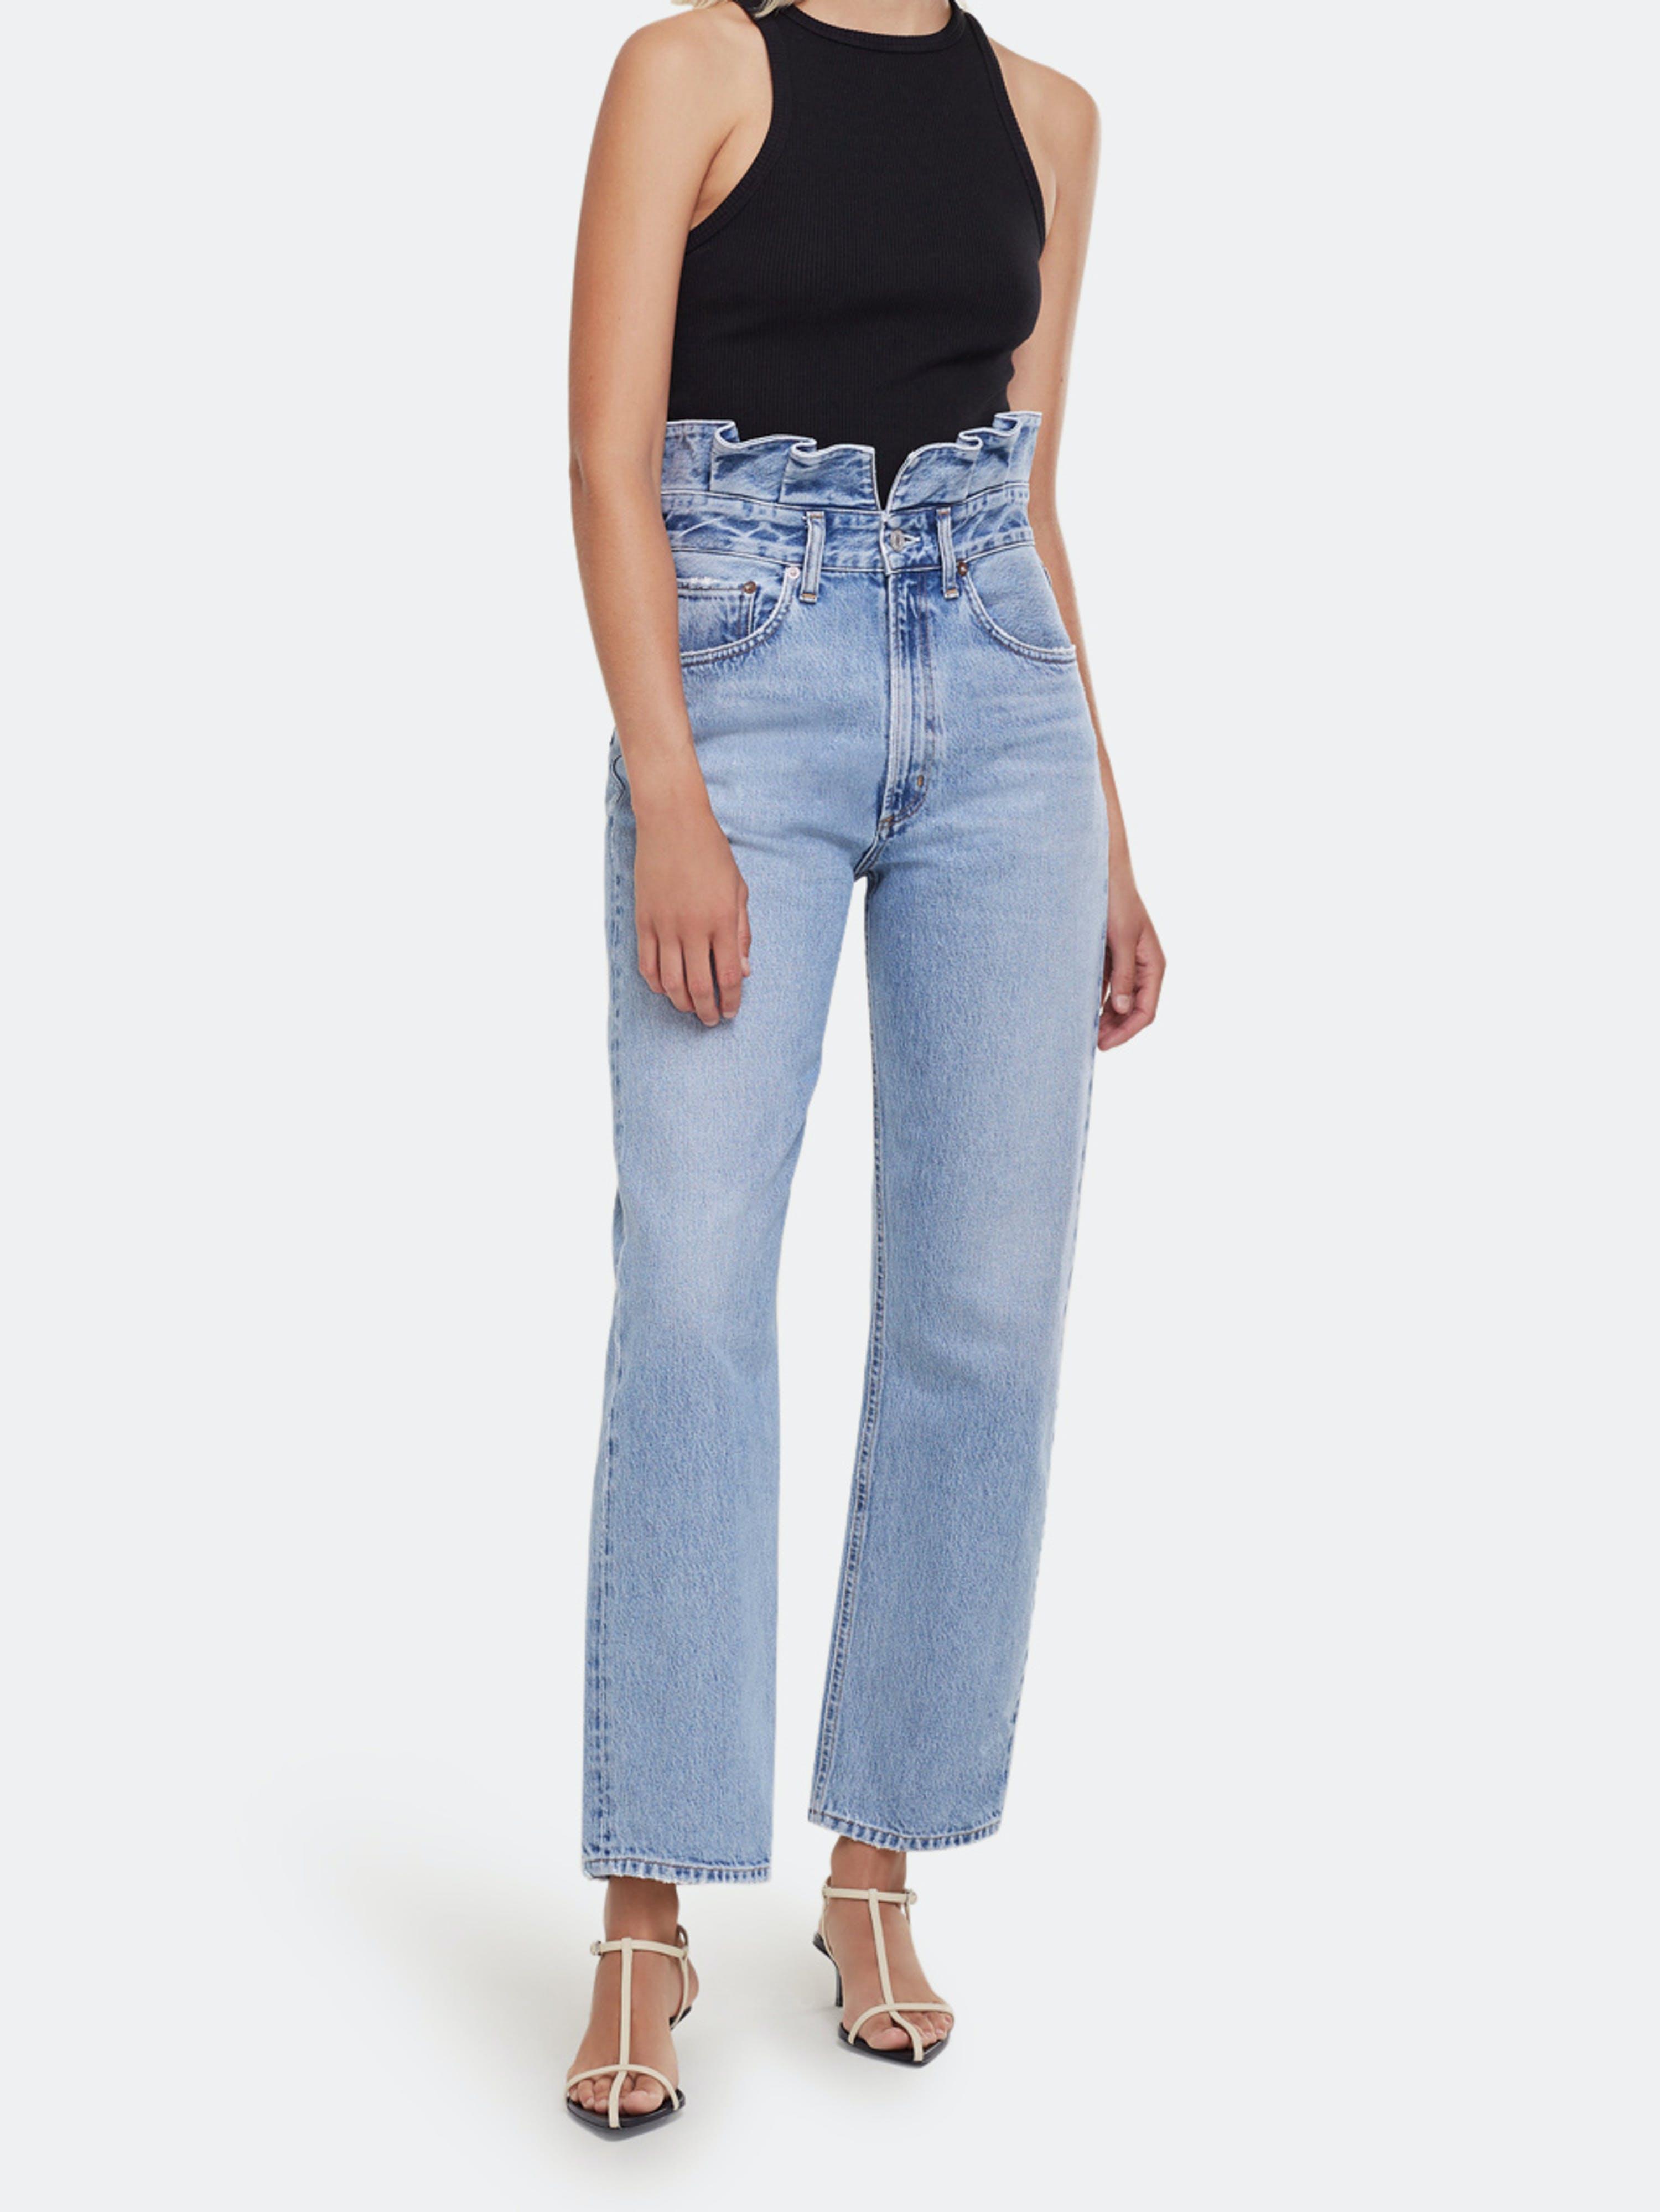 Agolde Pants AGOLDE LETTUCE WAISTBAND HIGH RISE FULL LENGTH STRAIGHT JEANS